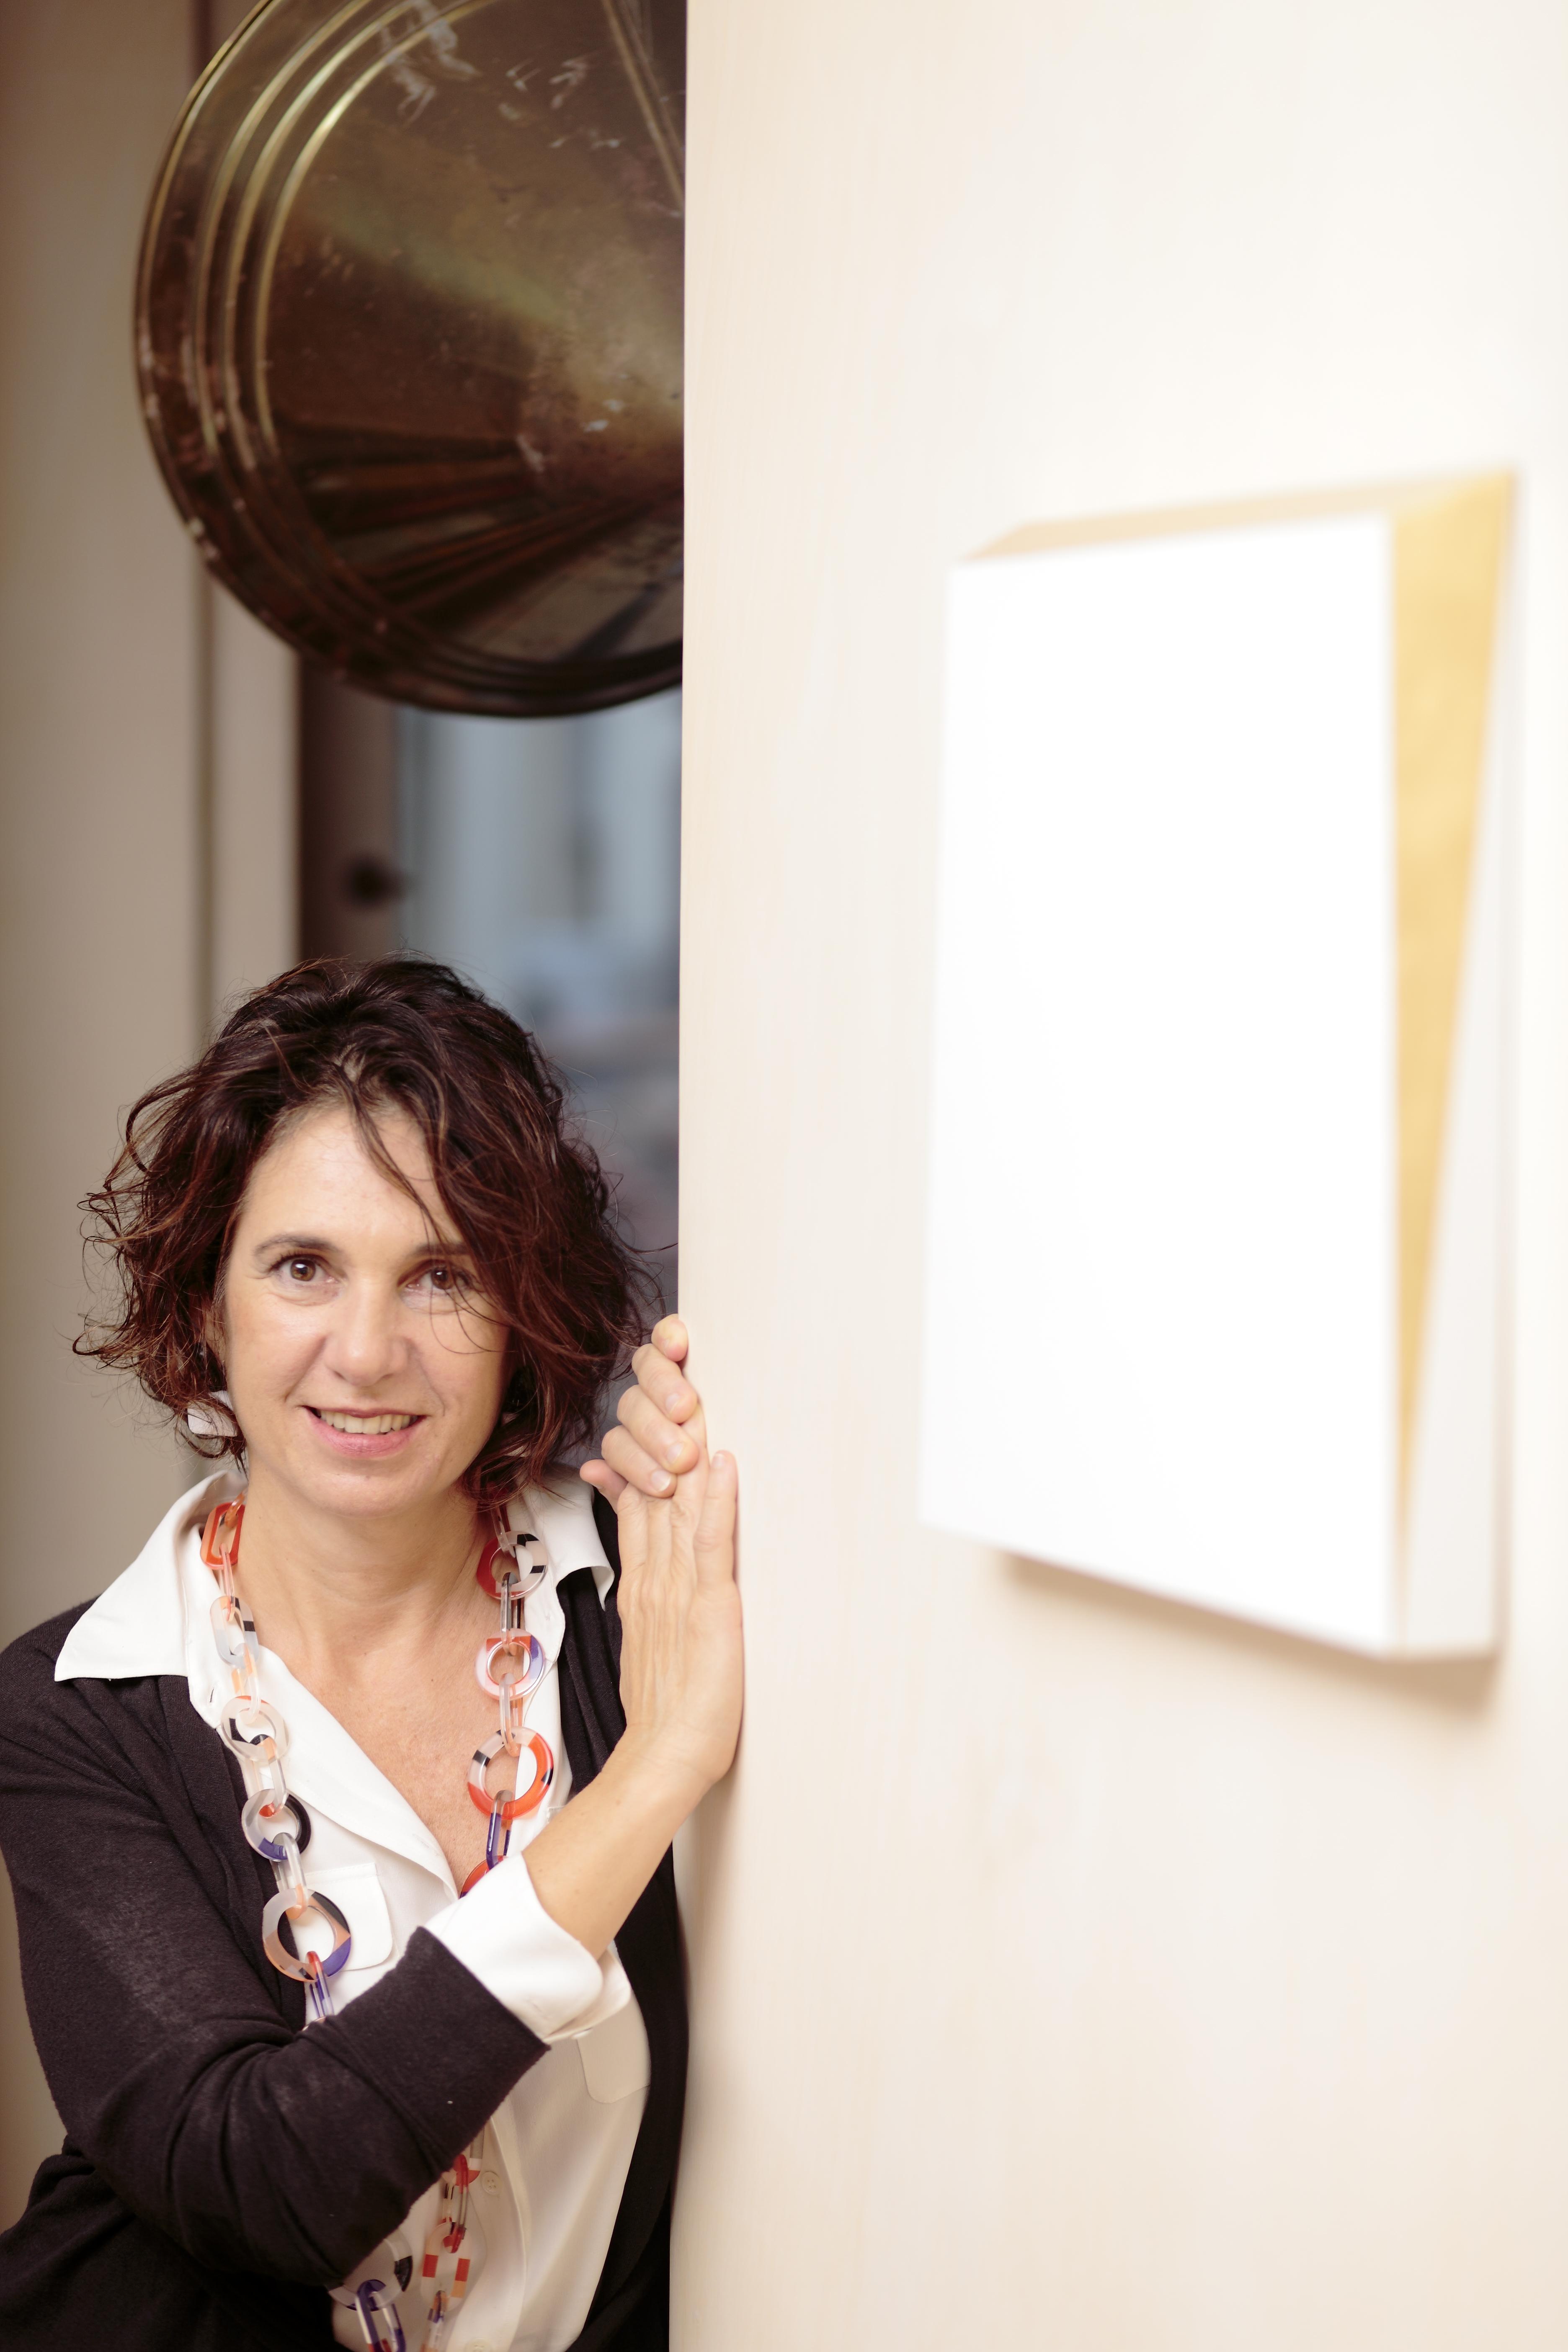 Tiziana Frescobaldi, artistic director of Artisti per Frescobaldi